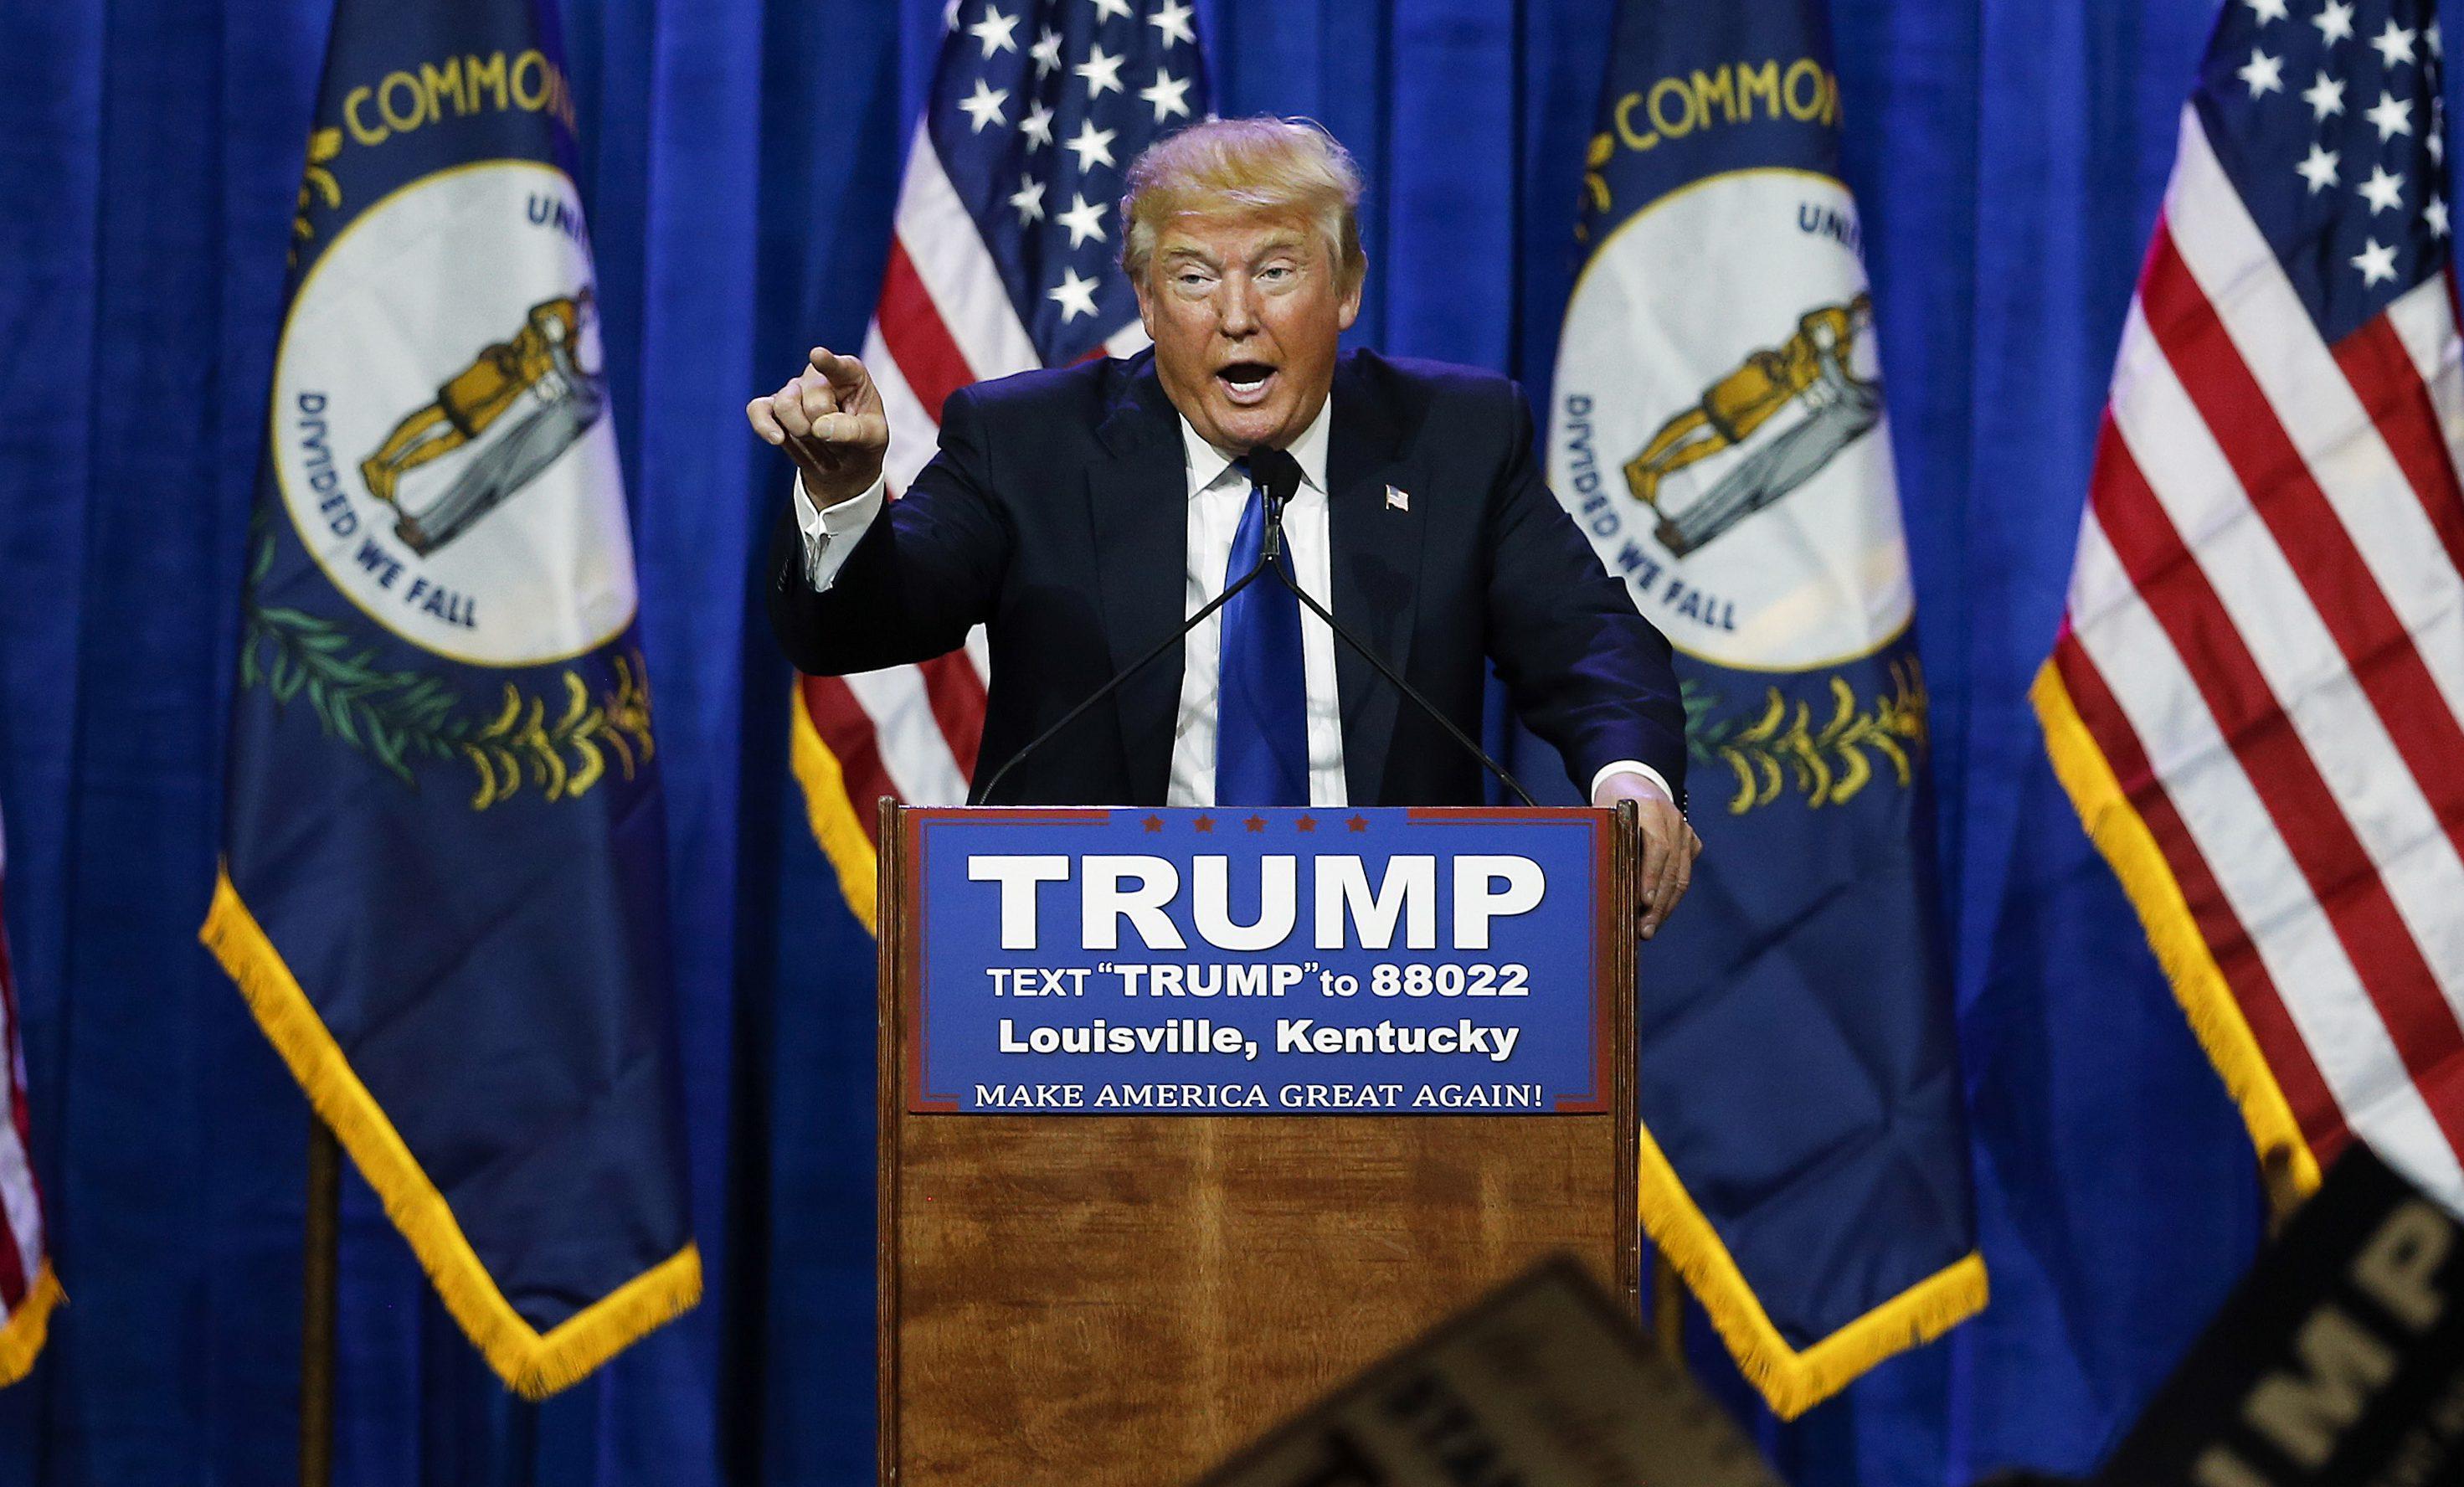 Image of Trump.